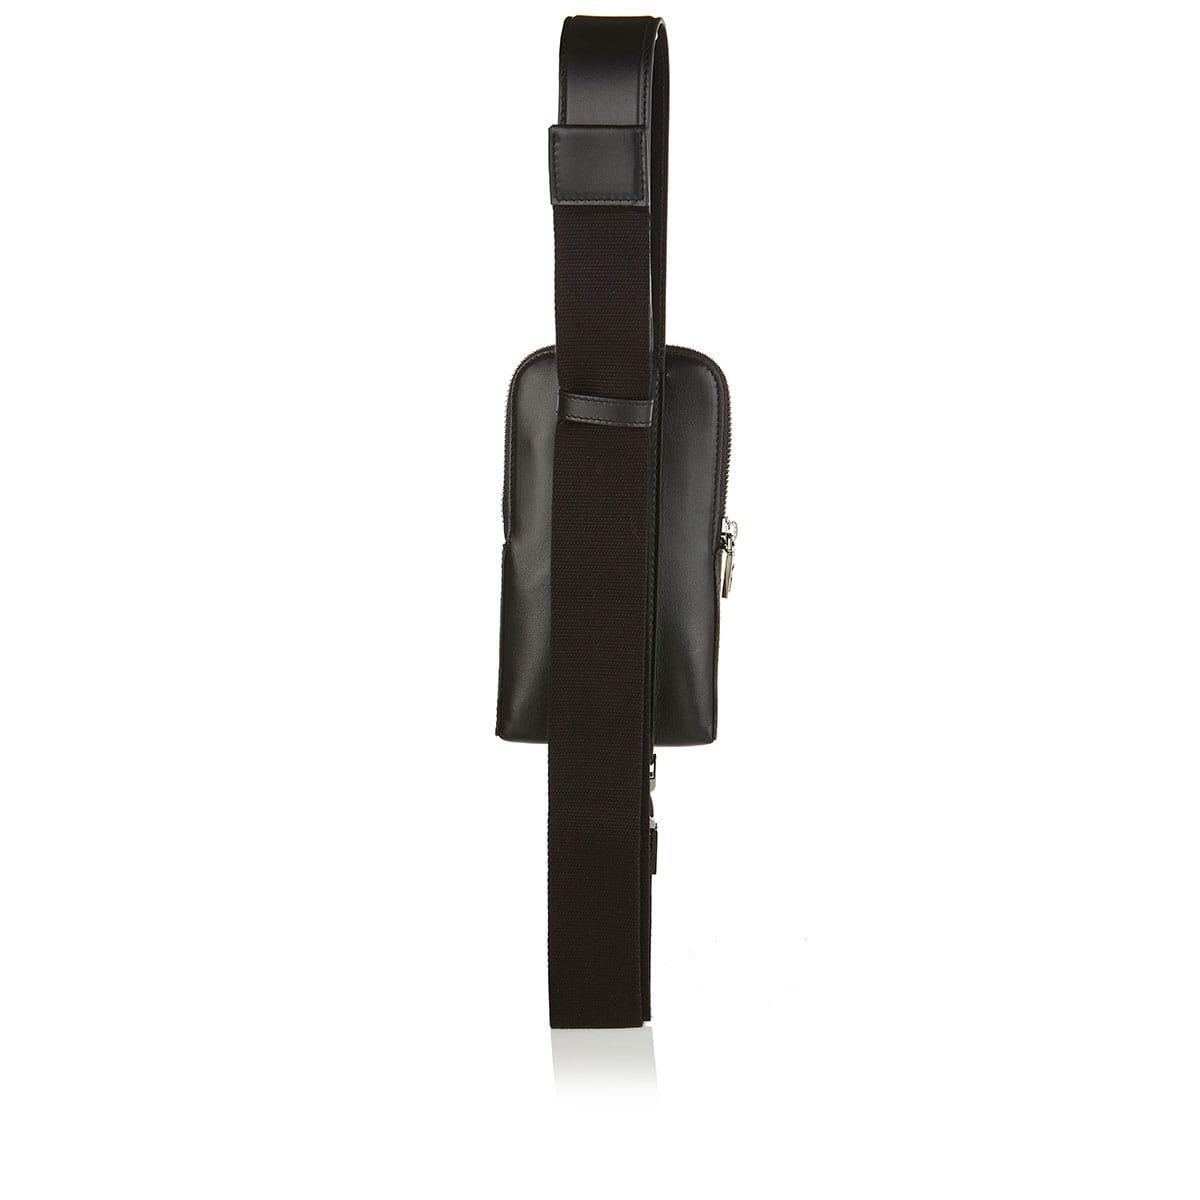 Smartphone crossbody leather case